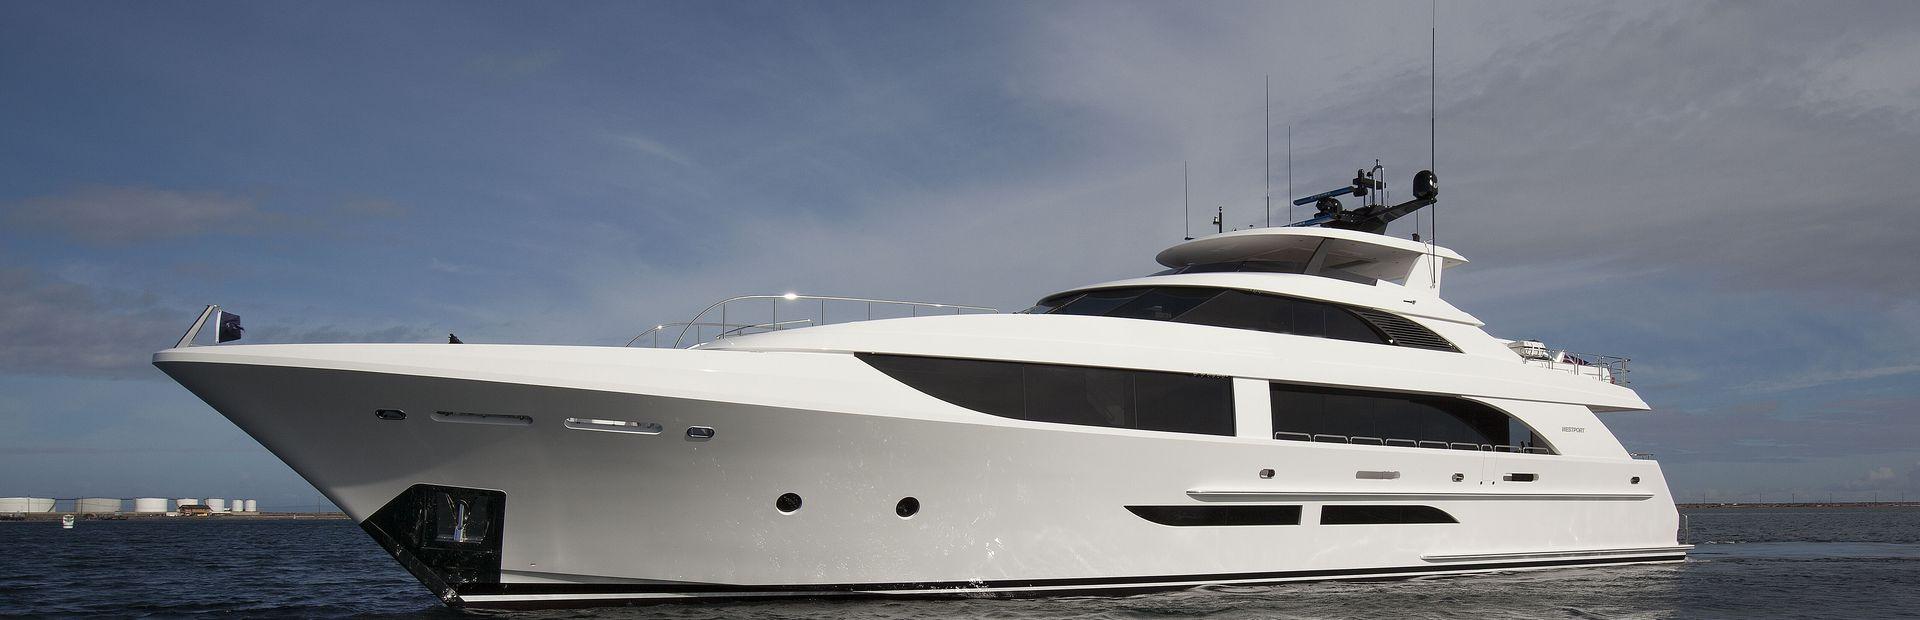 Westport 125 Yacht Charter